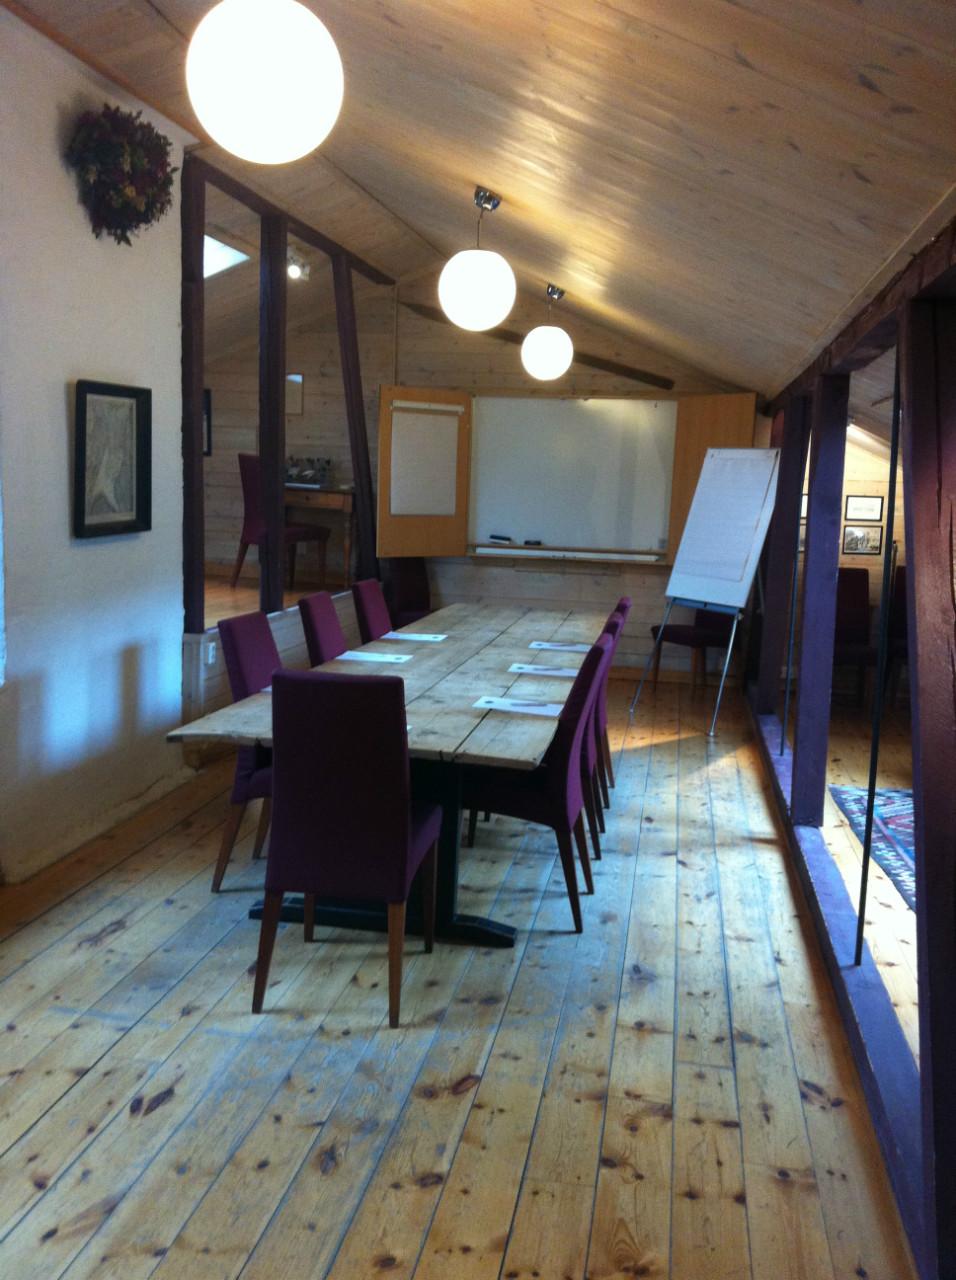 Loft-Meeting-Room-Museum-Projector-Old-Kleivstua-1780-VGA (3).JPG